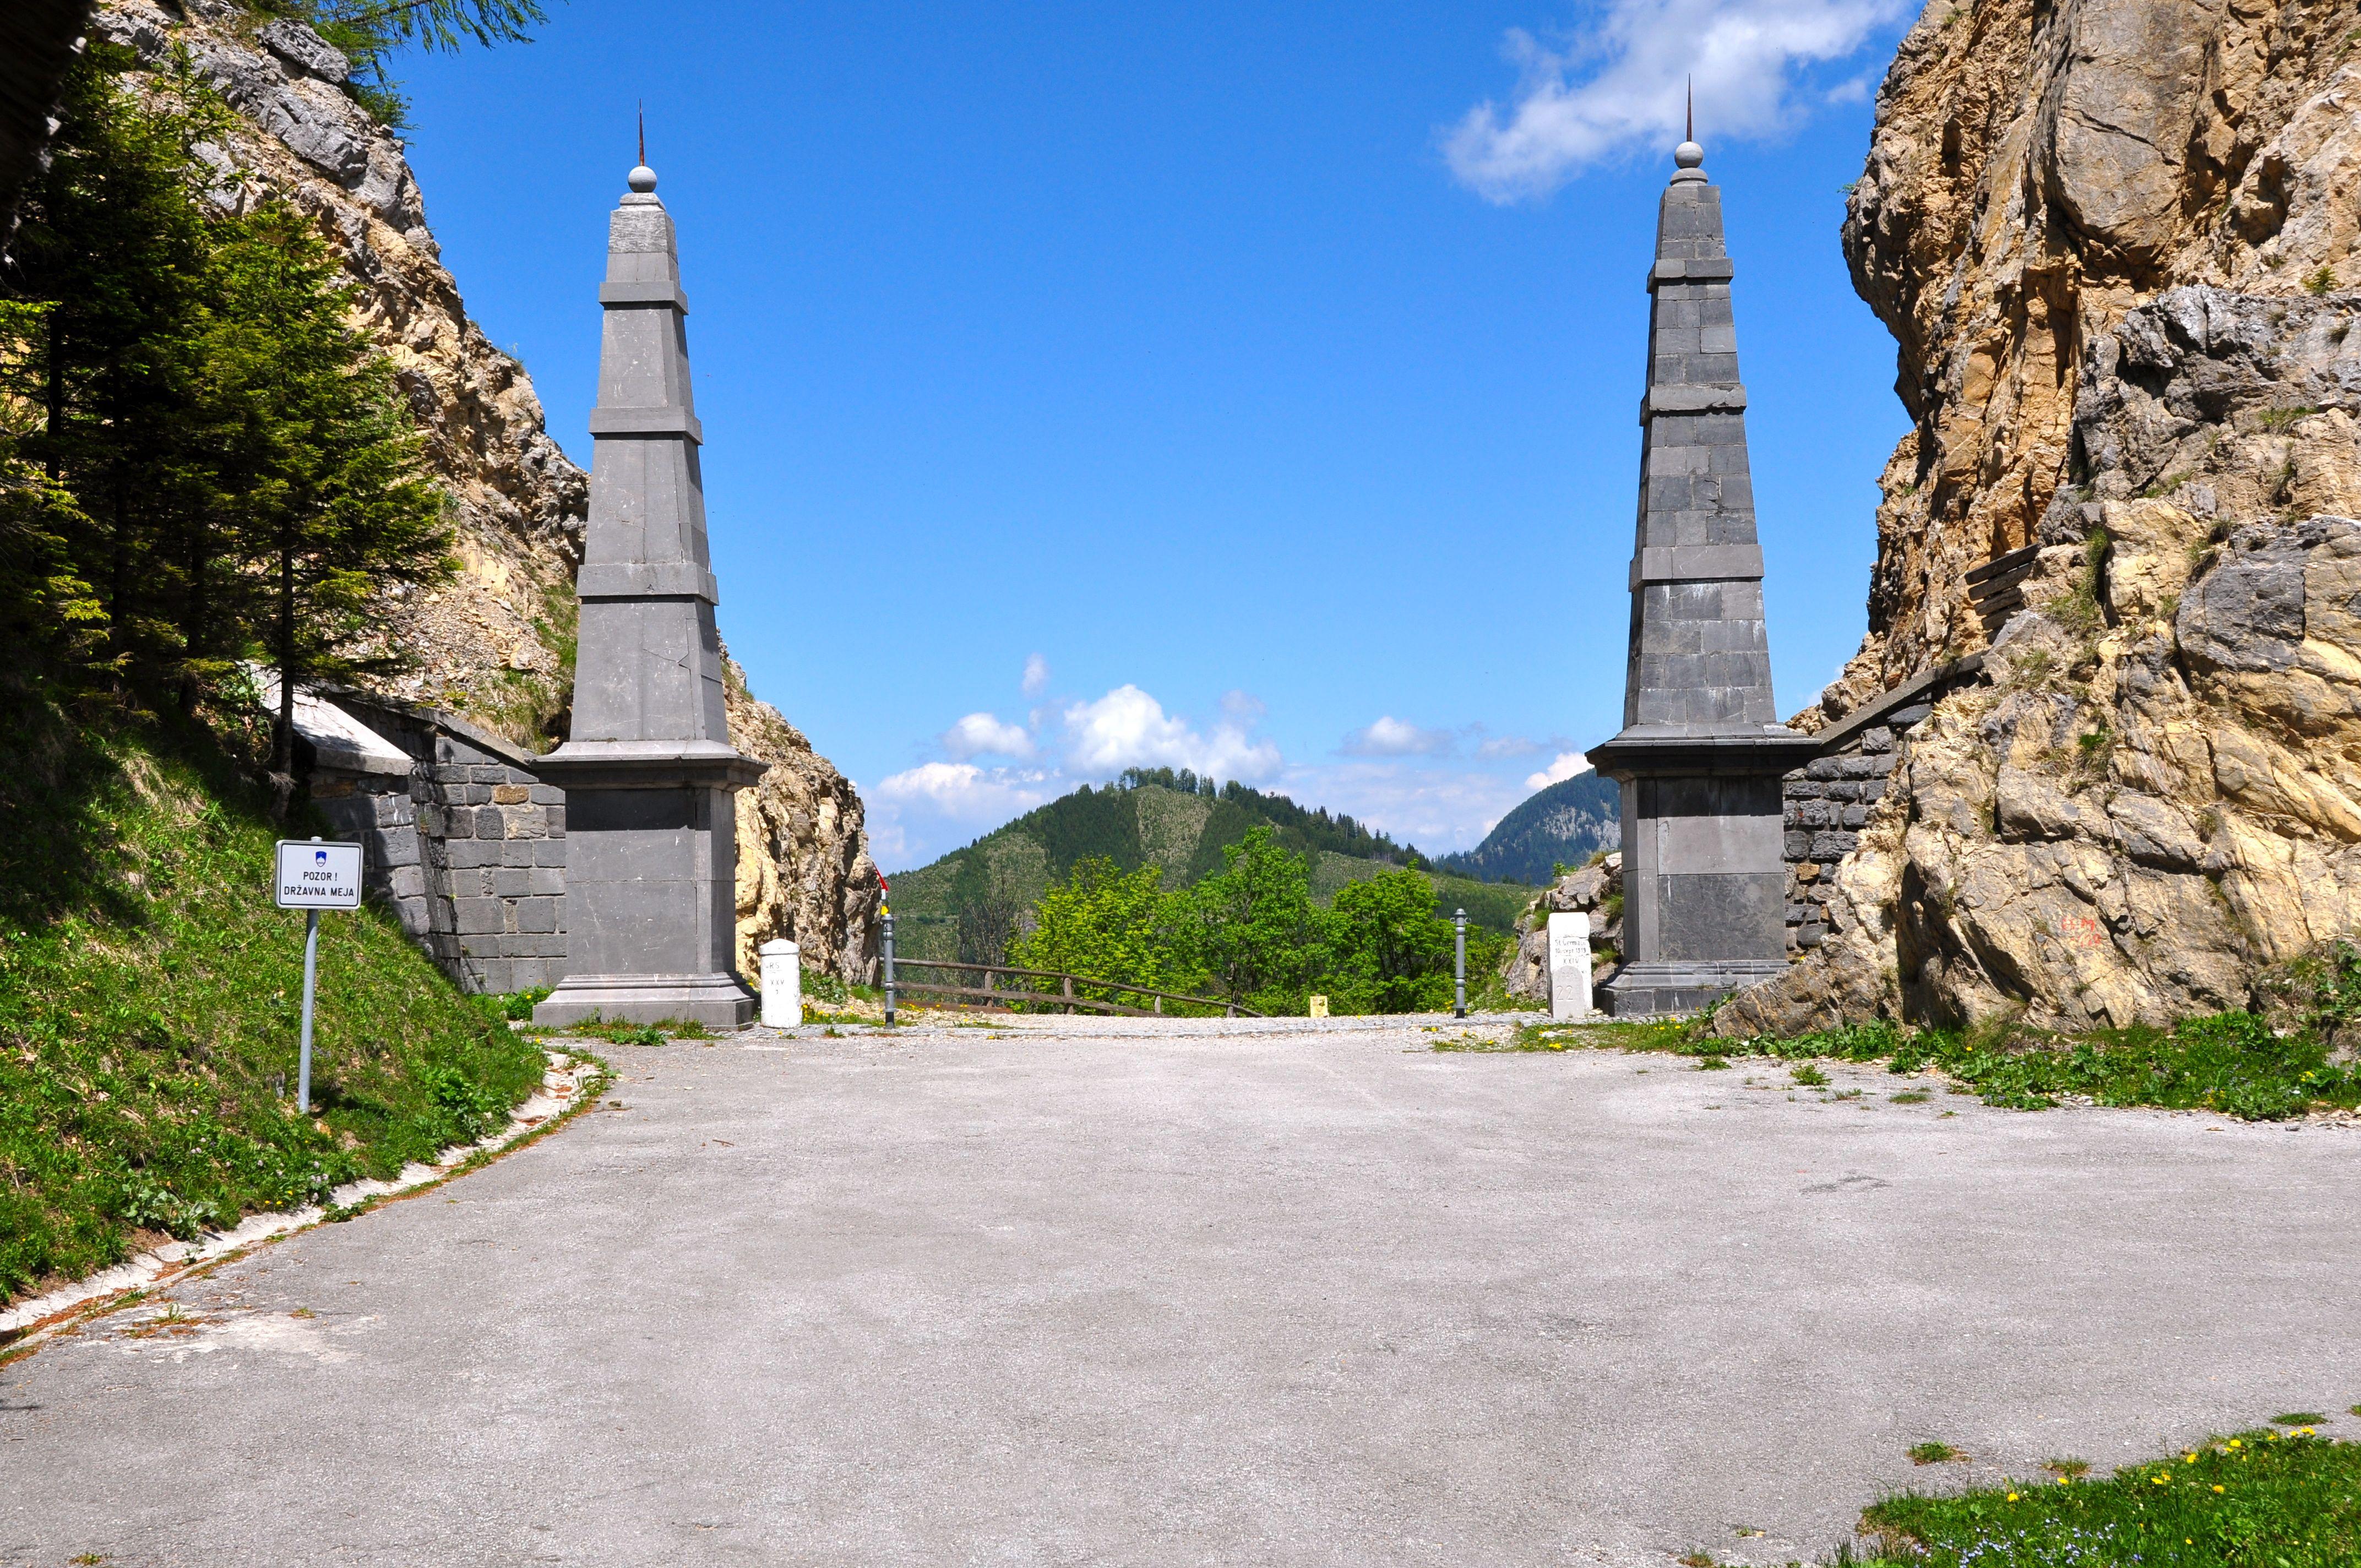 https://upload.wikimedia.org/wikipedia/commons/1/1c/Ferlach_Loibltal_Alter_Loiblpass_mit_Obelisken_24052011_556.jpg